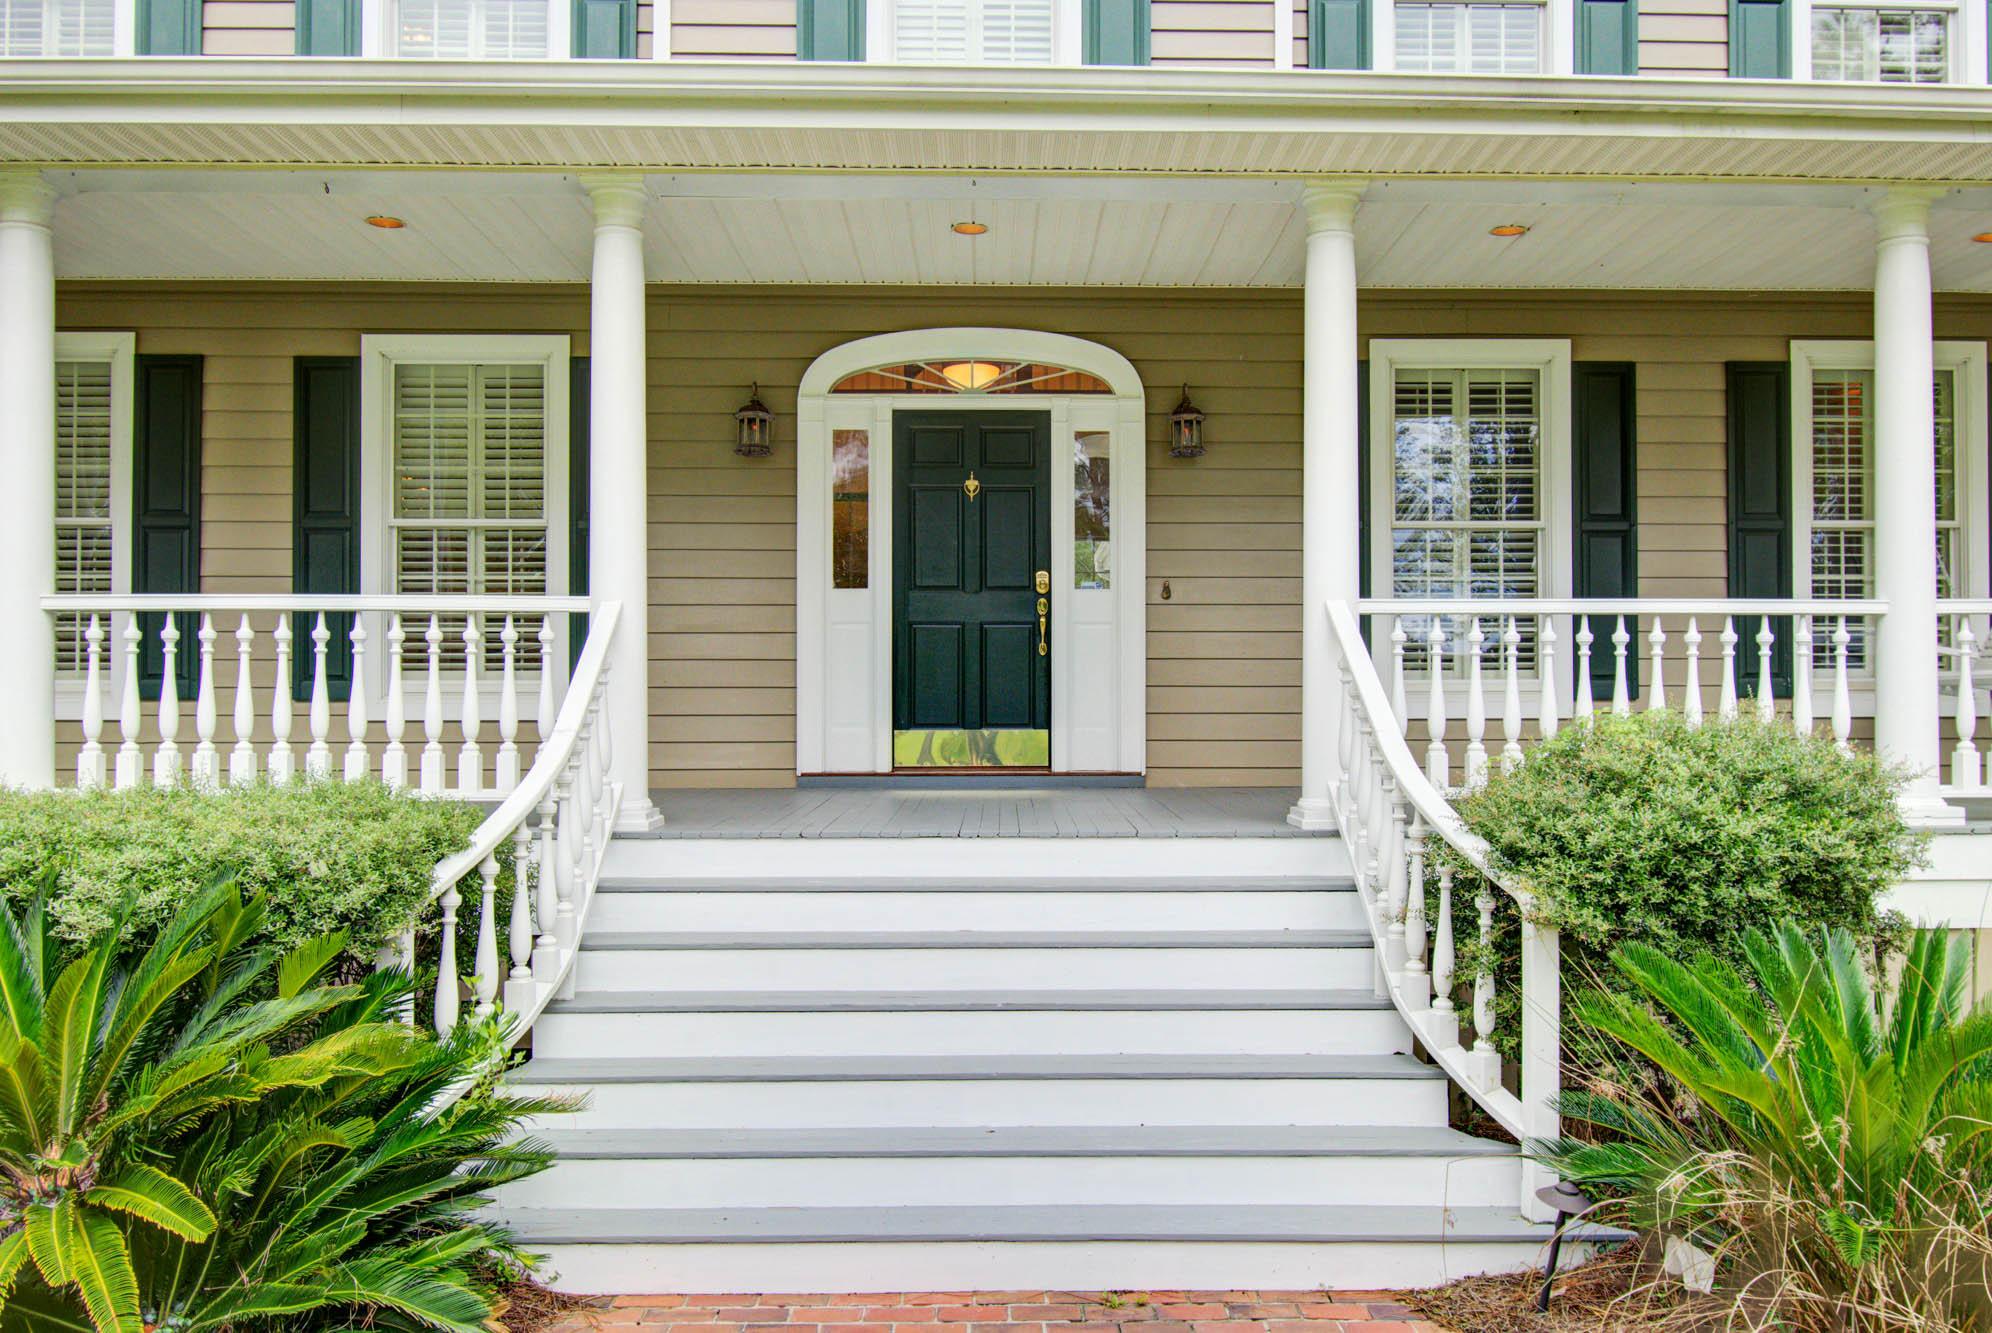 Dunes West Homes For Sale - 3515 Colonel Vanderhorst, Mount Pleasant, SC - 34